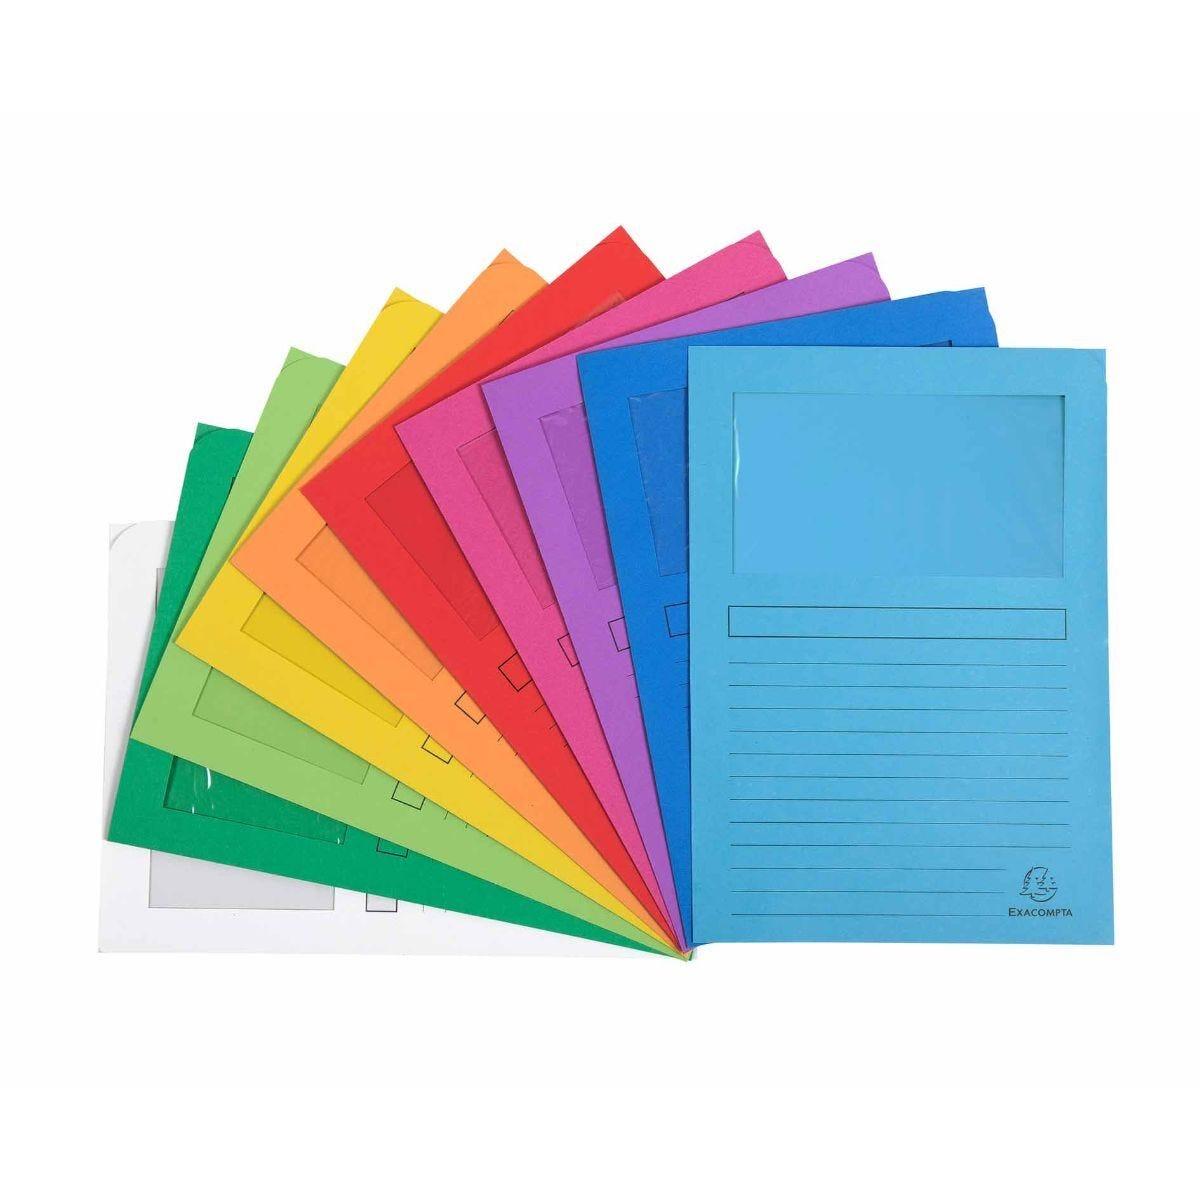 Exacompta Forever Window Folder A4 4 Packs of 100 120gsm Assorted